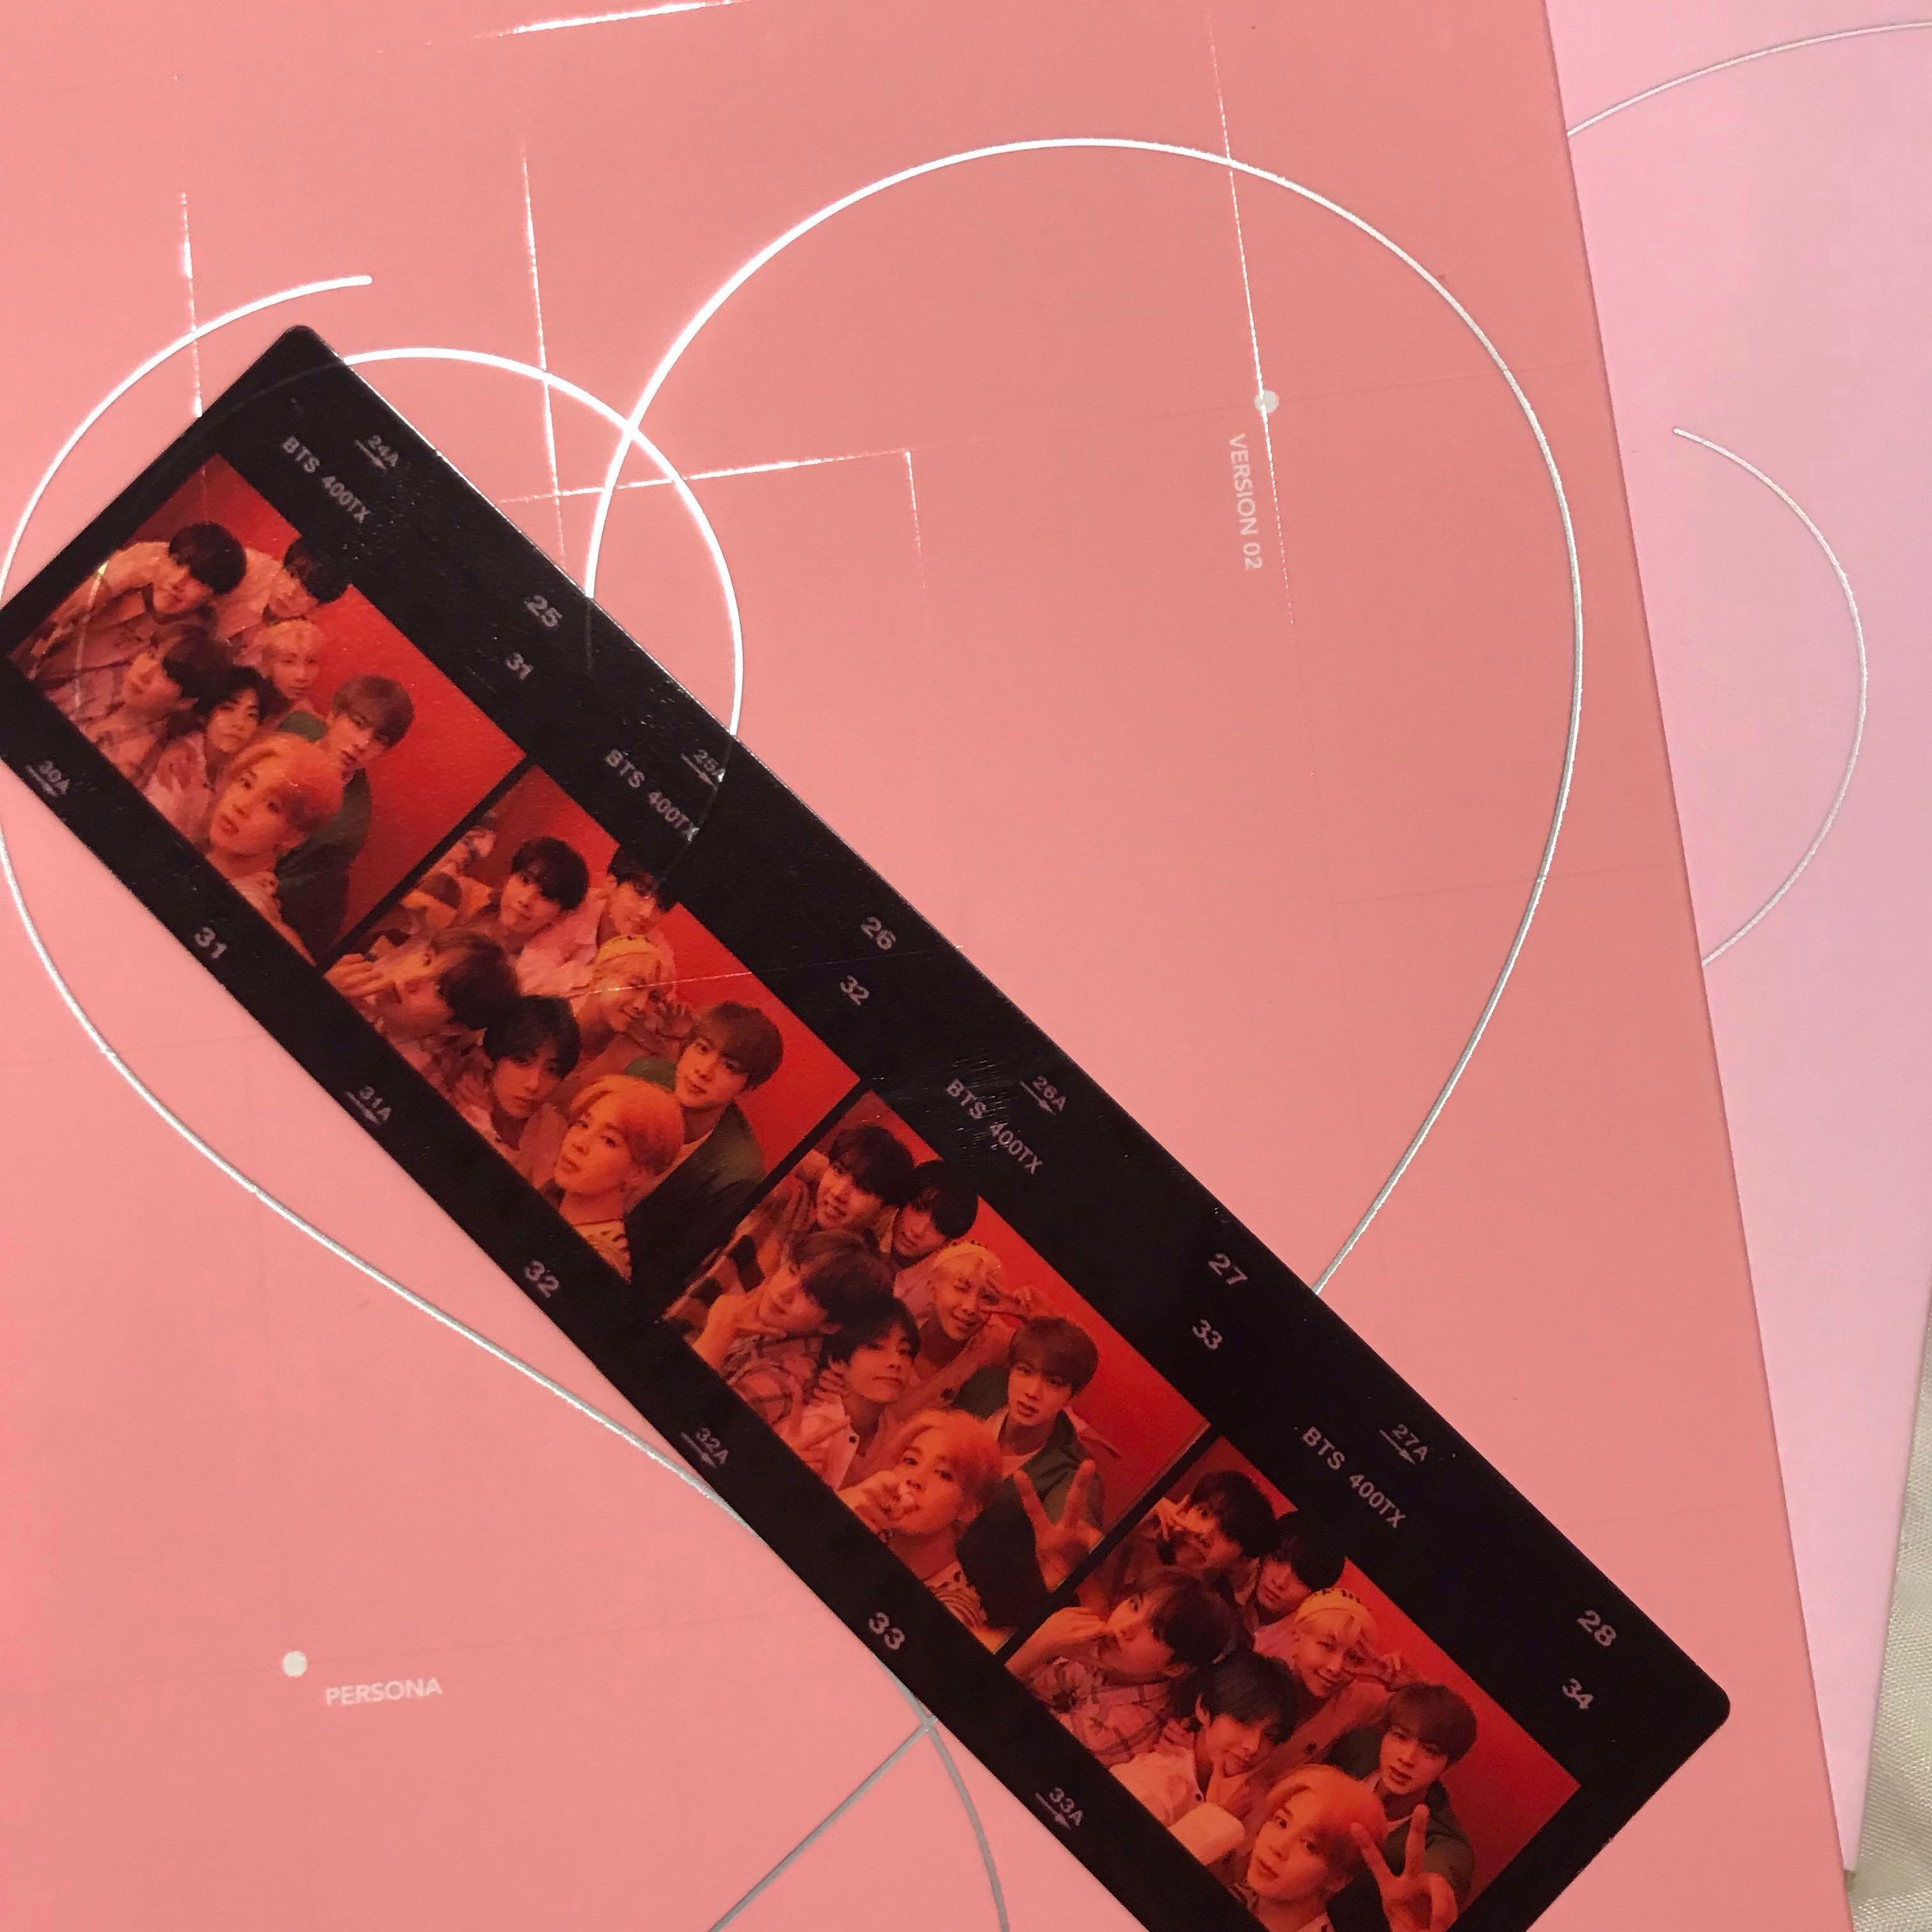 BTS PERSONA Film Strip